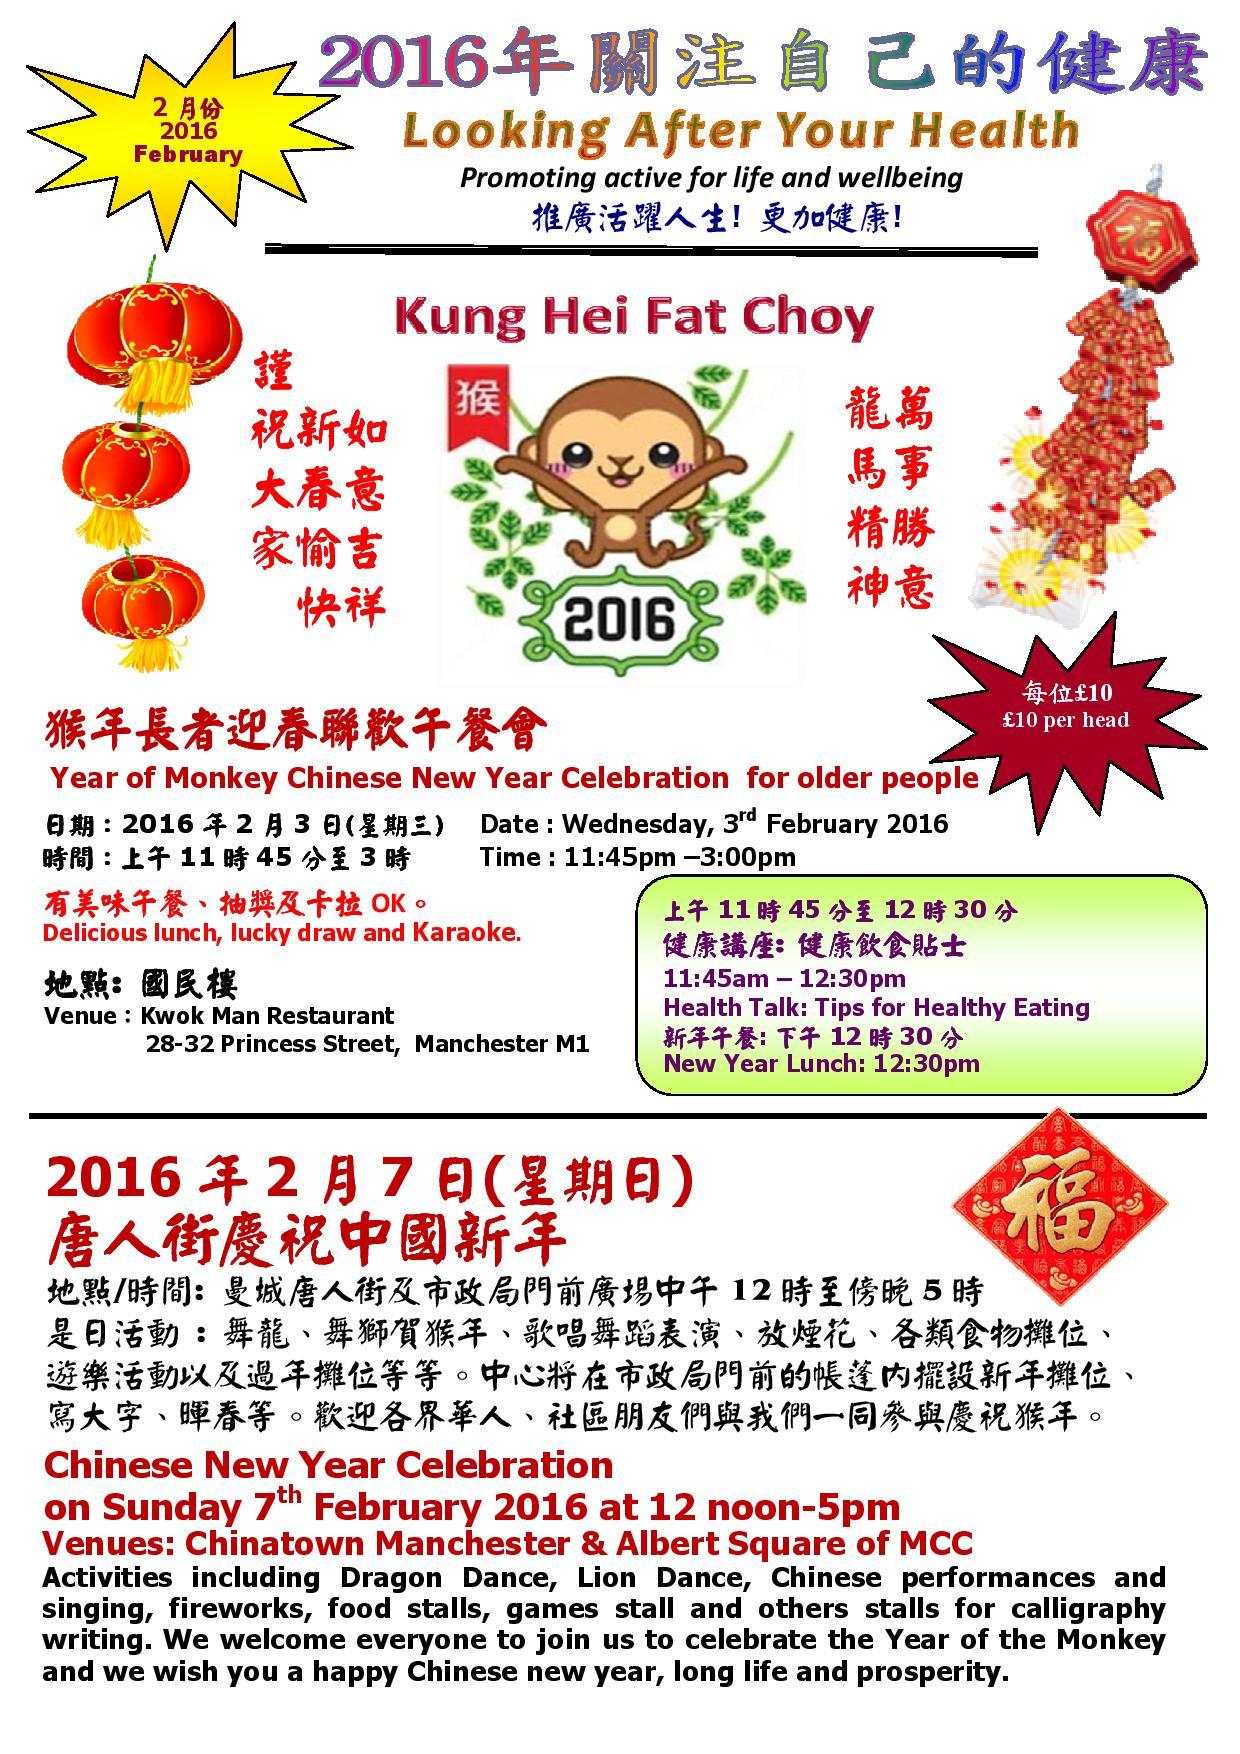 February 2016 Health Programme